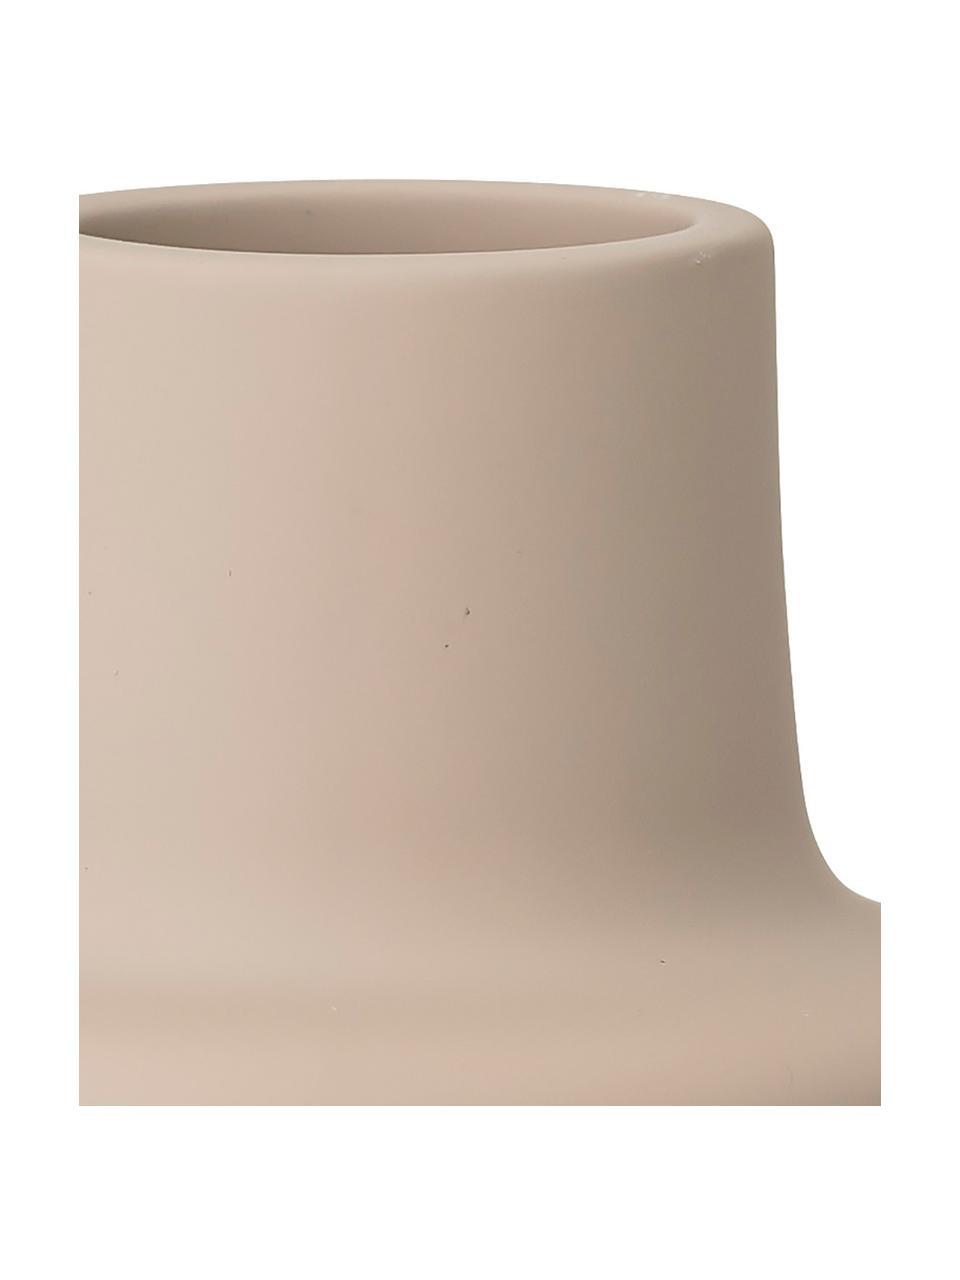 Waxinelichthouder Noma van keramiek, Keramiek, Beige, Ø 10 x H 9 cm